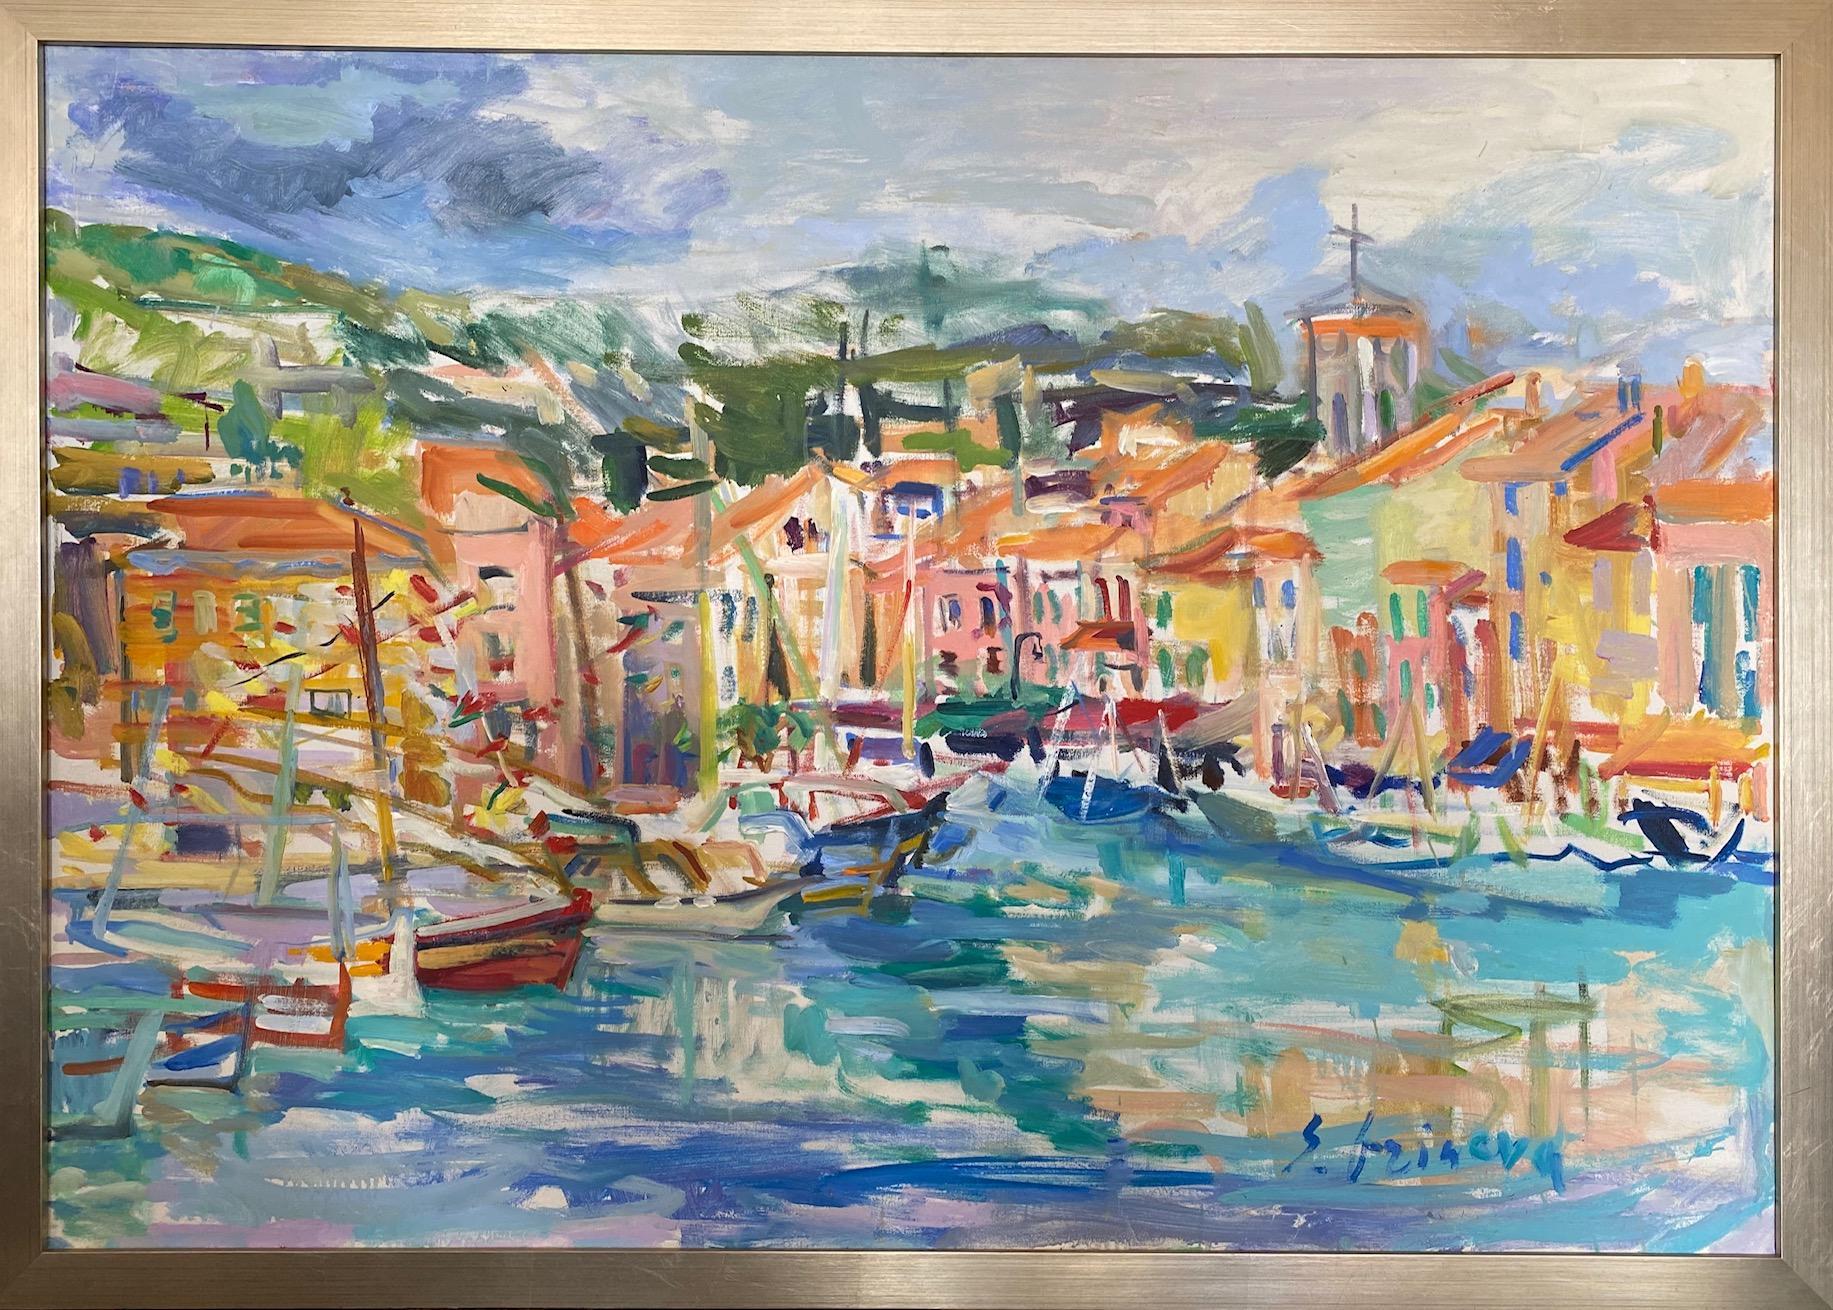 Cassis, original 32x46 abstract impressionist European landscape